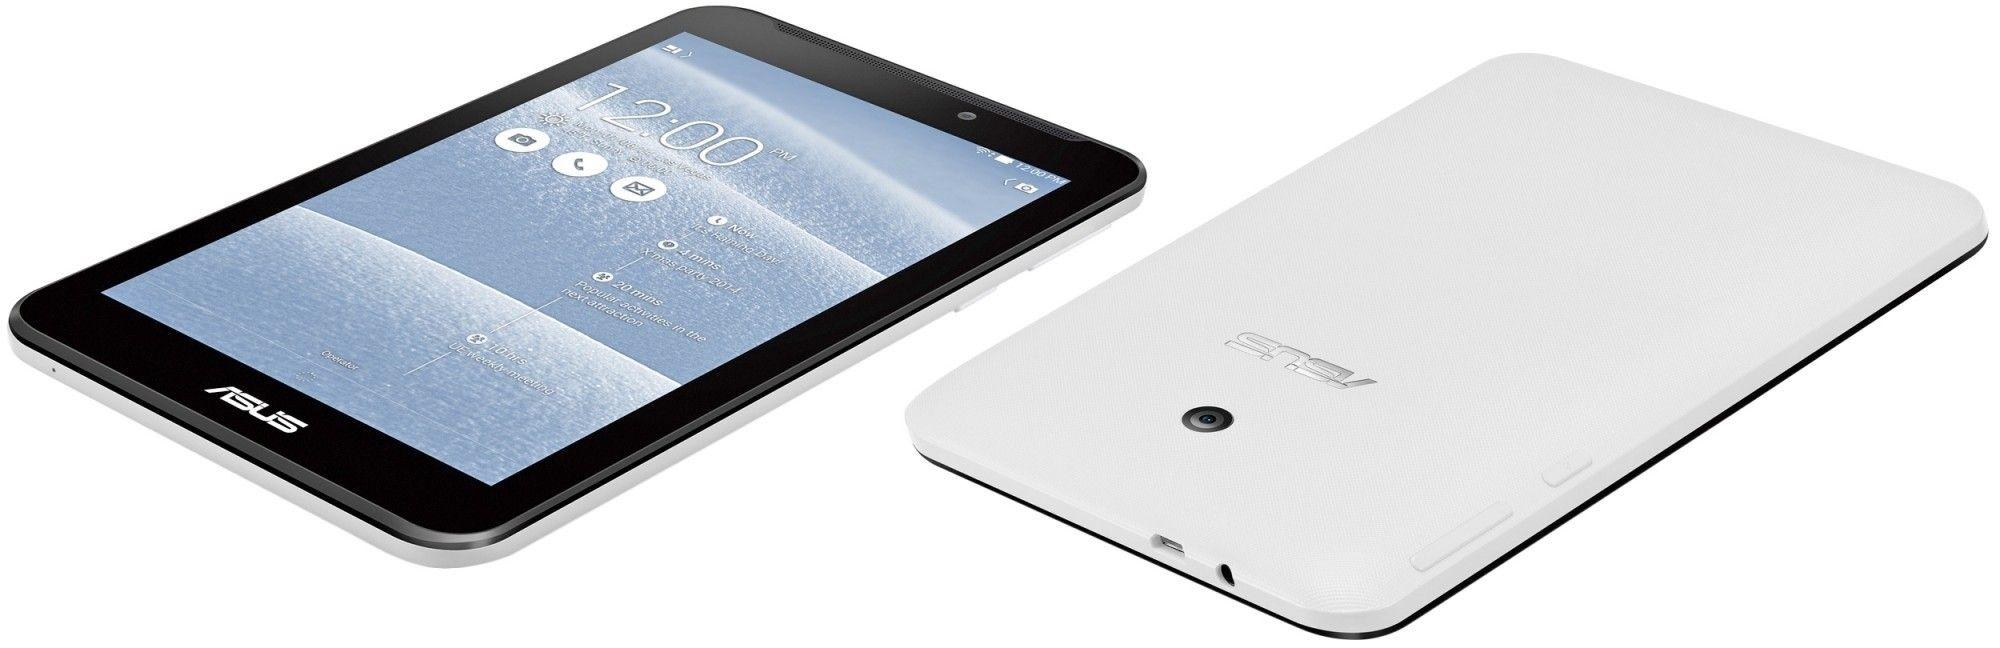 Планшет Asus Fonepad 7 3G 8GB White (FE170CG-1B011A) - 2